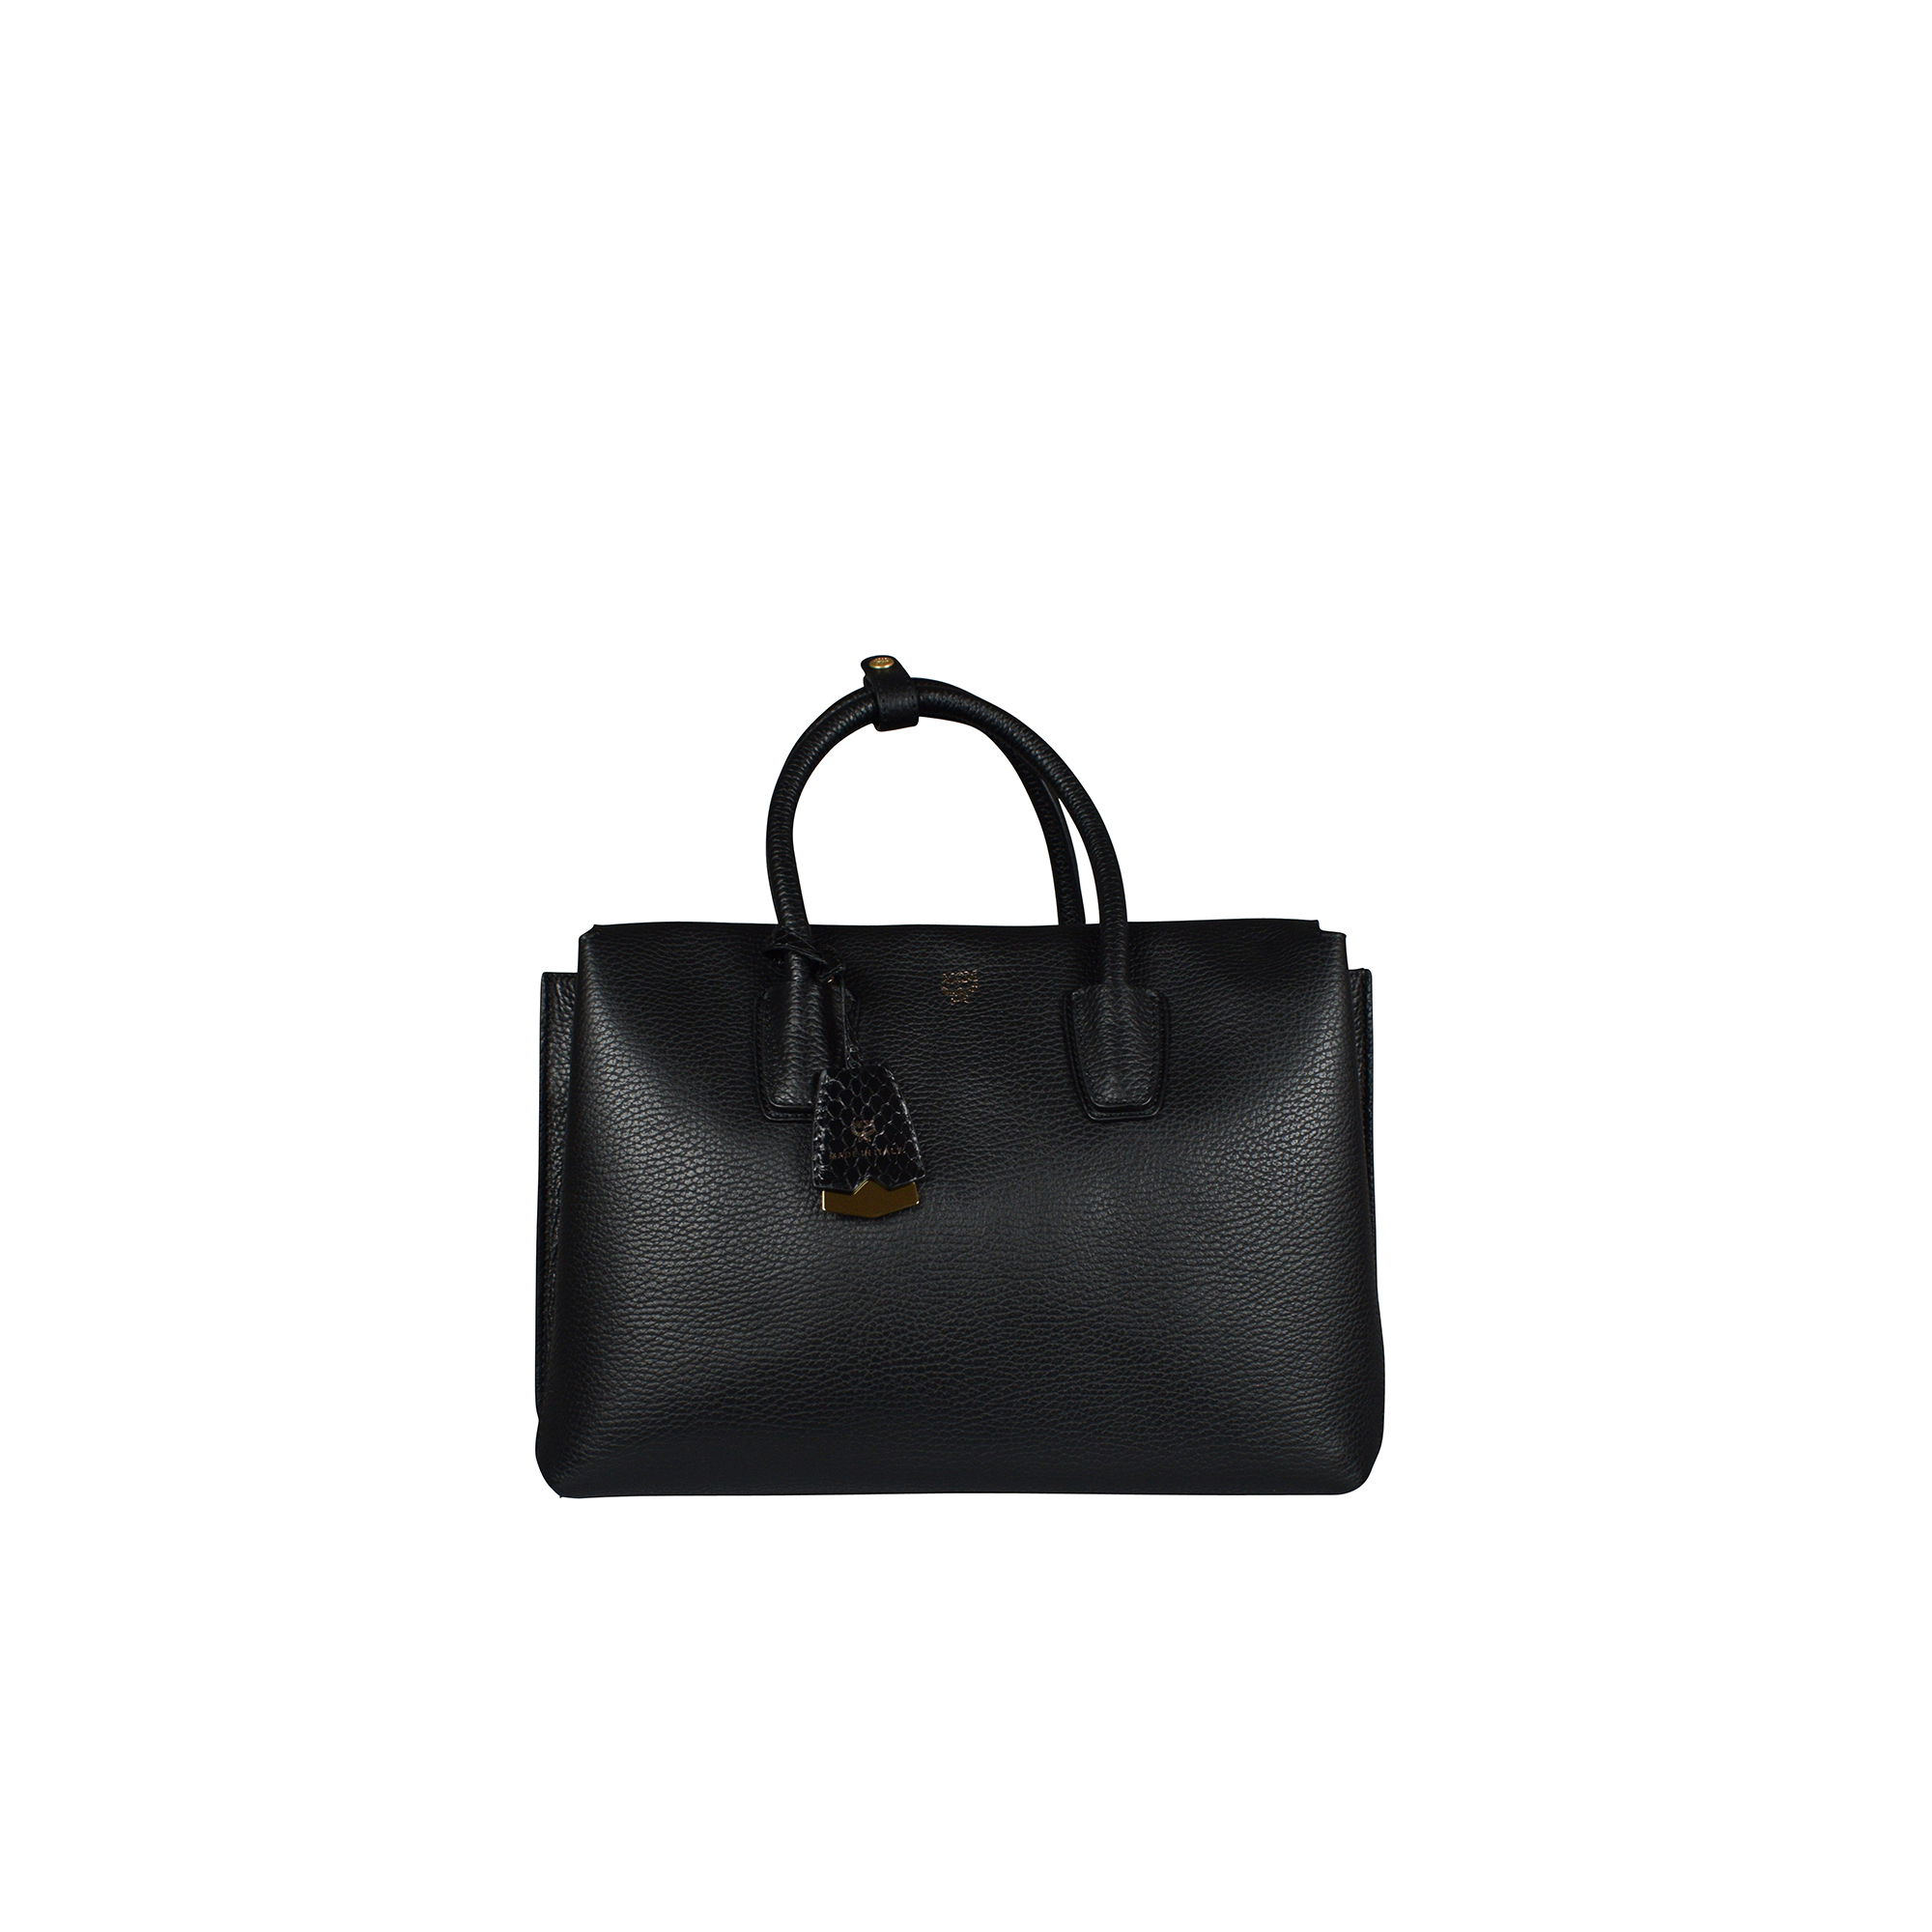 Milla MCM handbag in black leather.